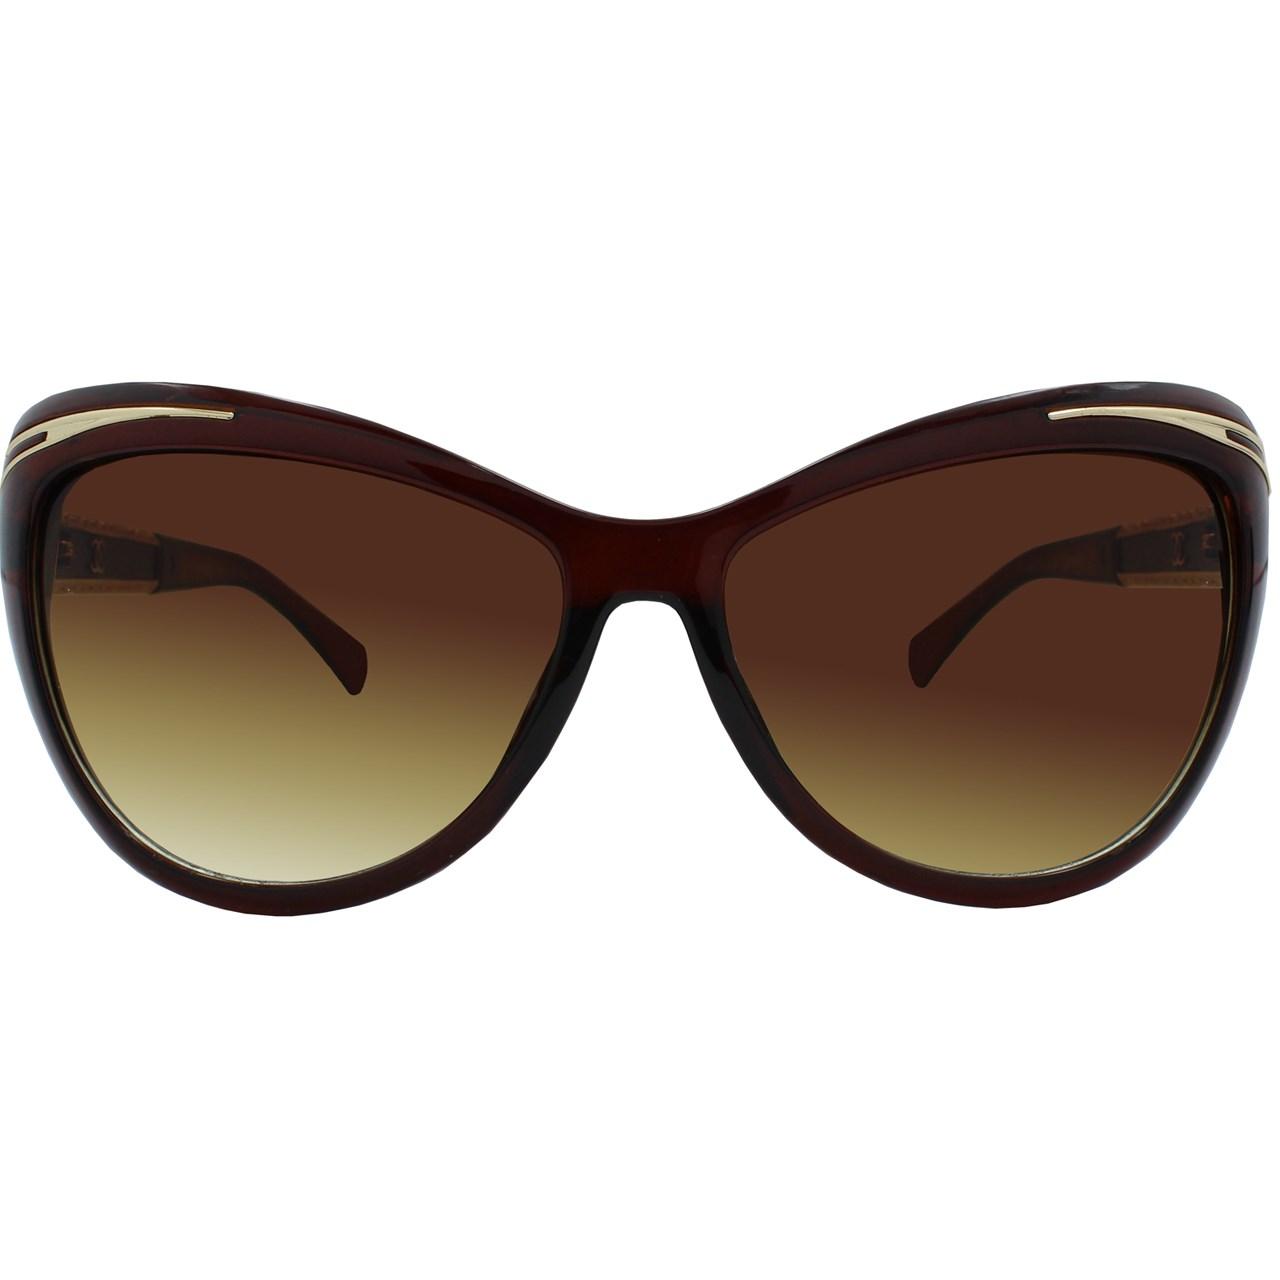 عینک آفتابی واته مدل 5295